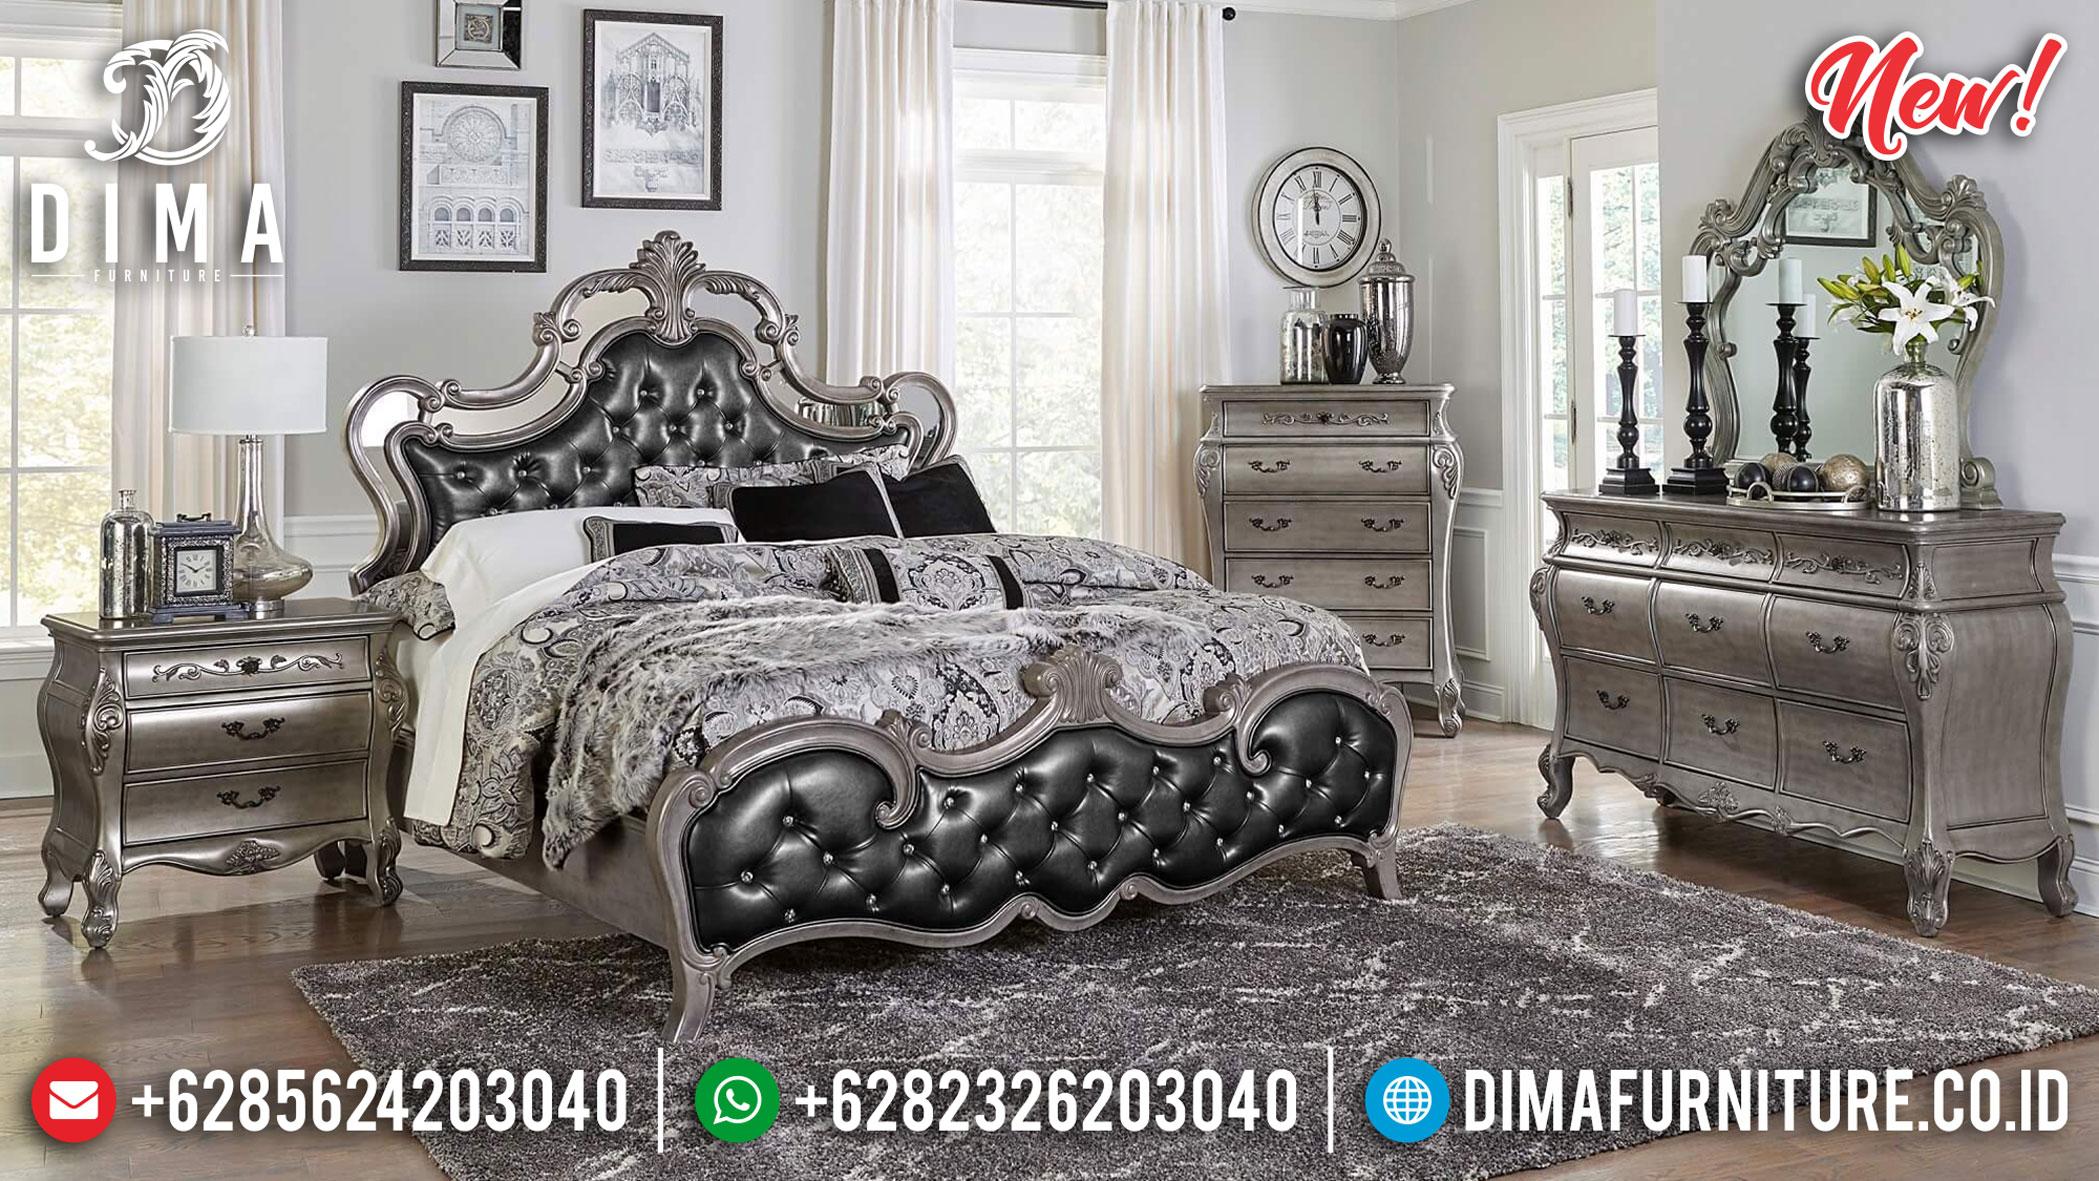 Set Tempat Tidur Mewah Klasik Brigette Silver ST-0909